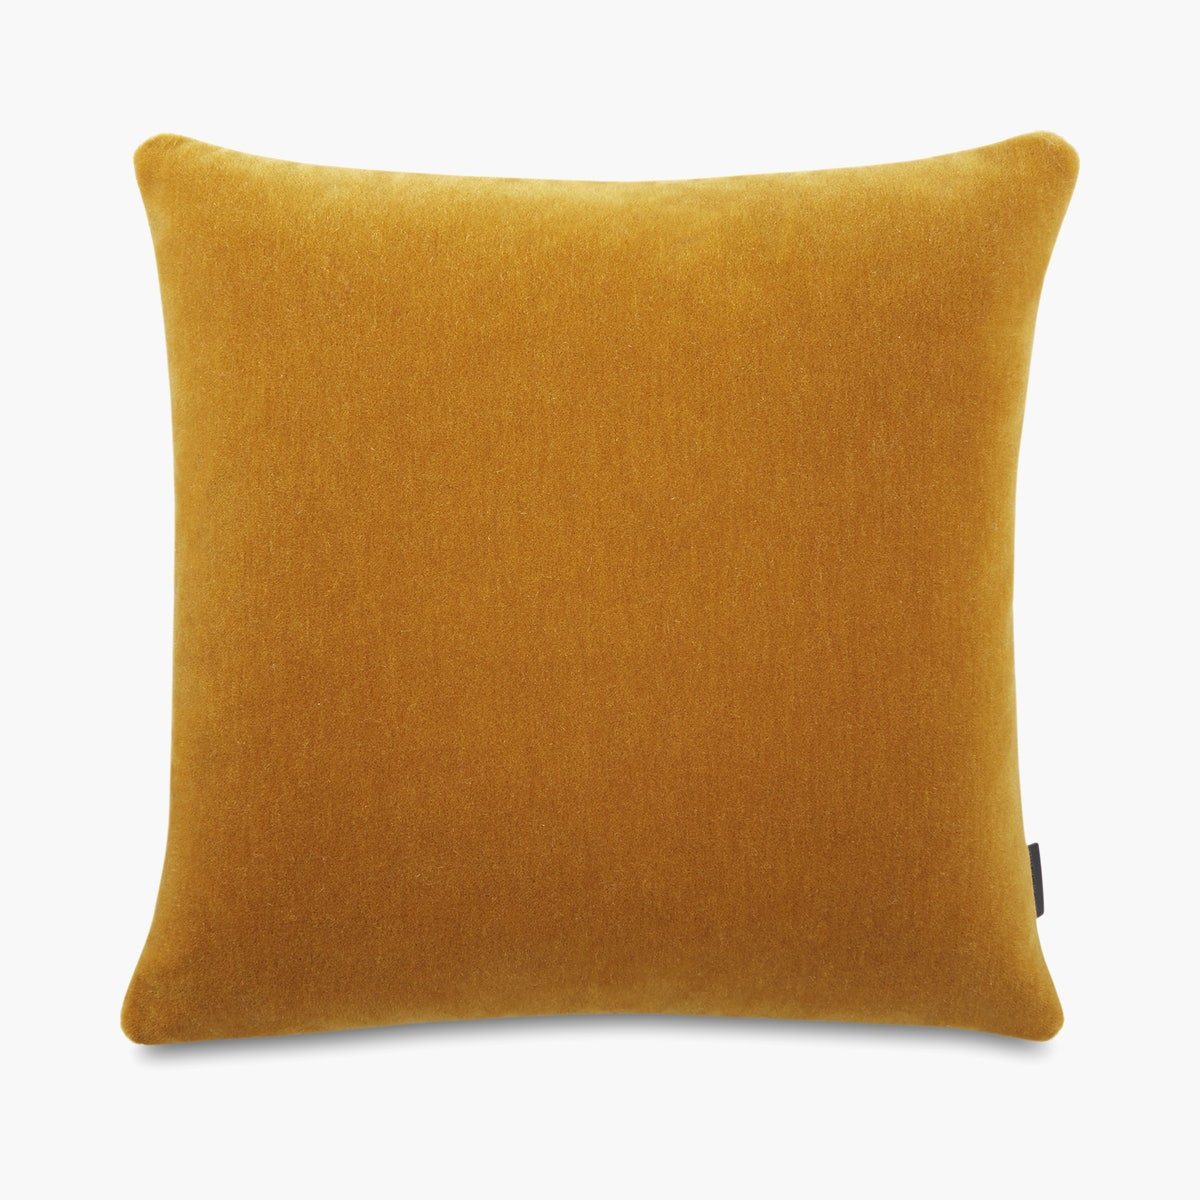 Maharam Pillow, Mohair Supreme